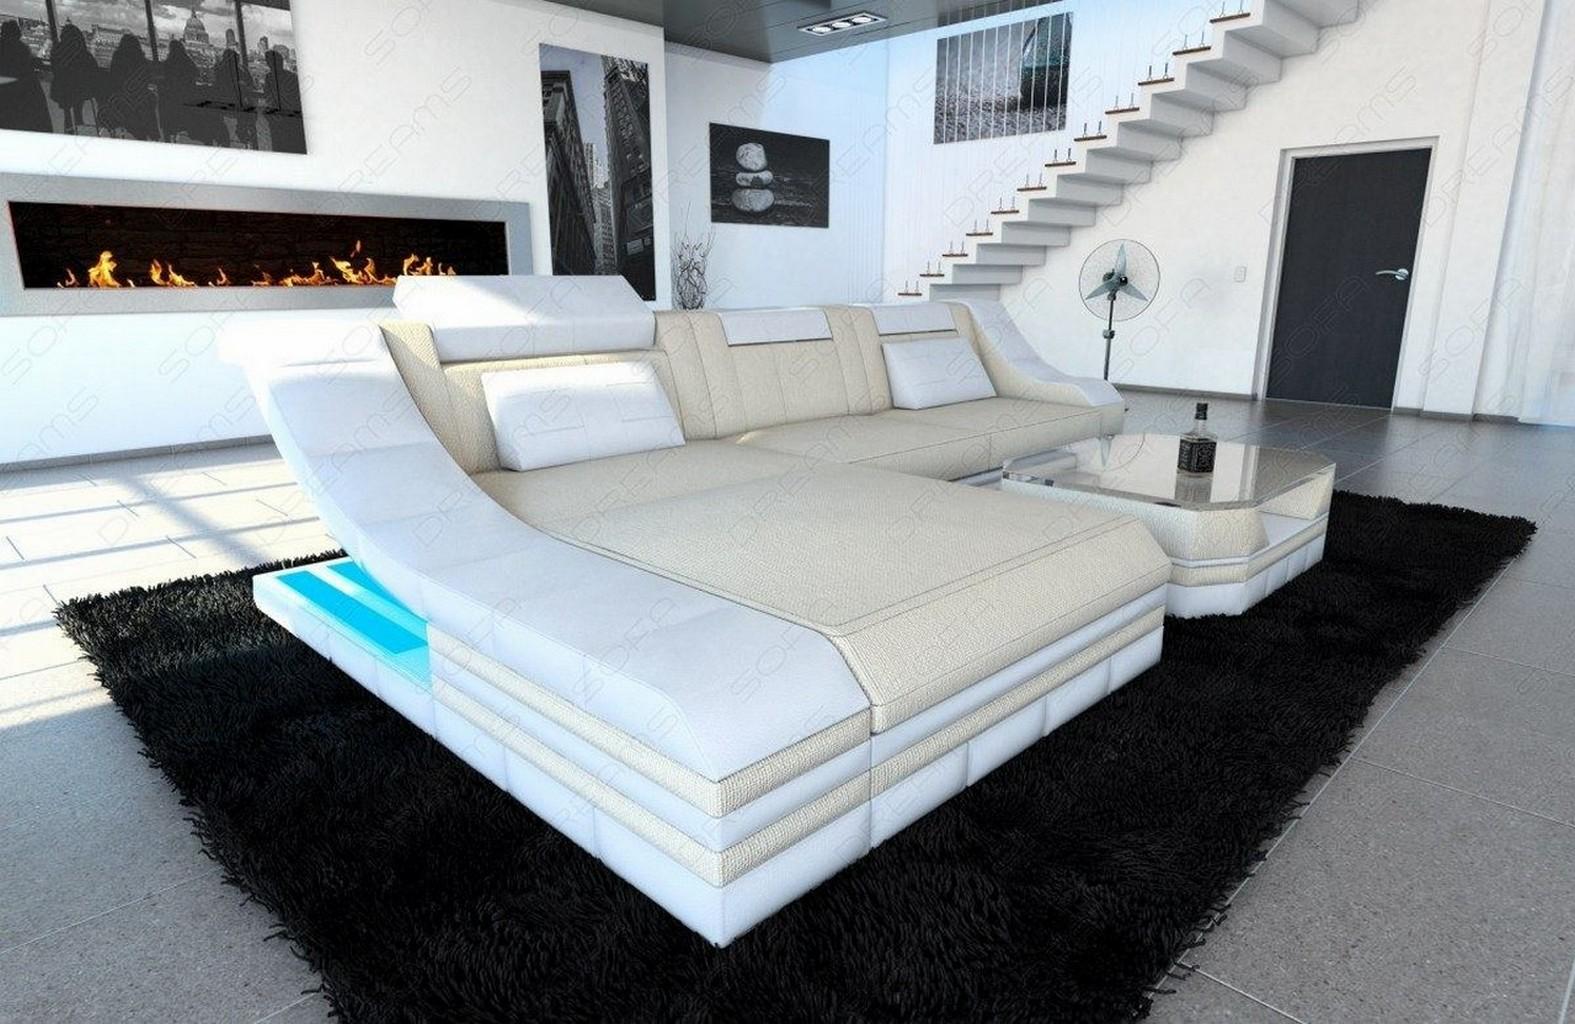 ecksofa mit beleuchtung stunning ecksofa couch sofa. Black Bedroom Furniture Sets. Home Design Ideas